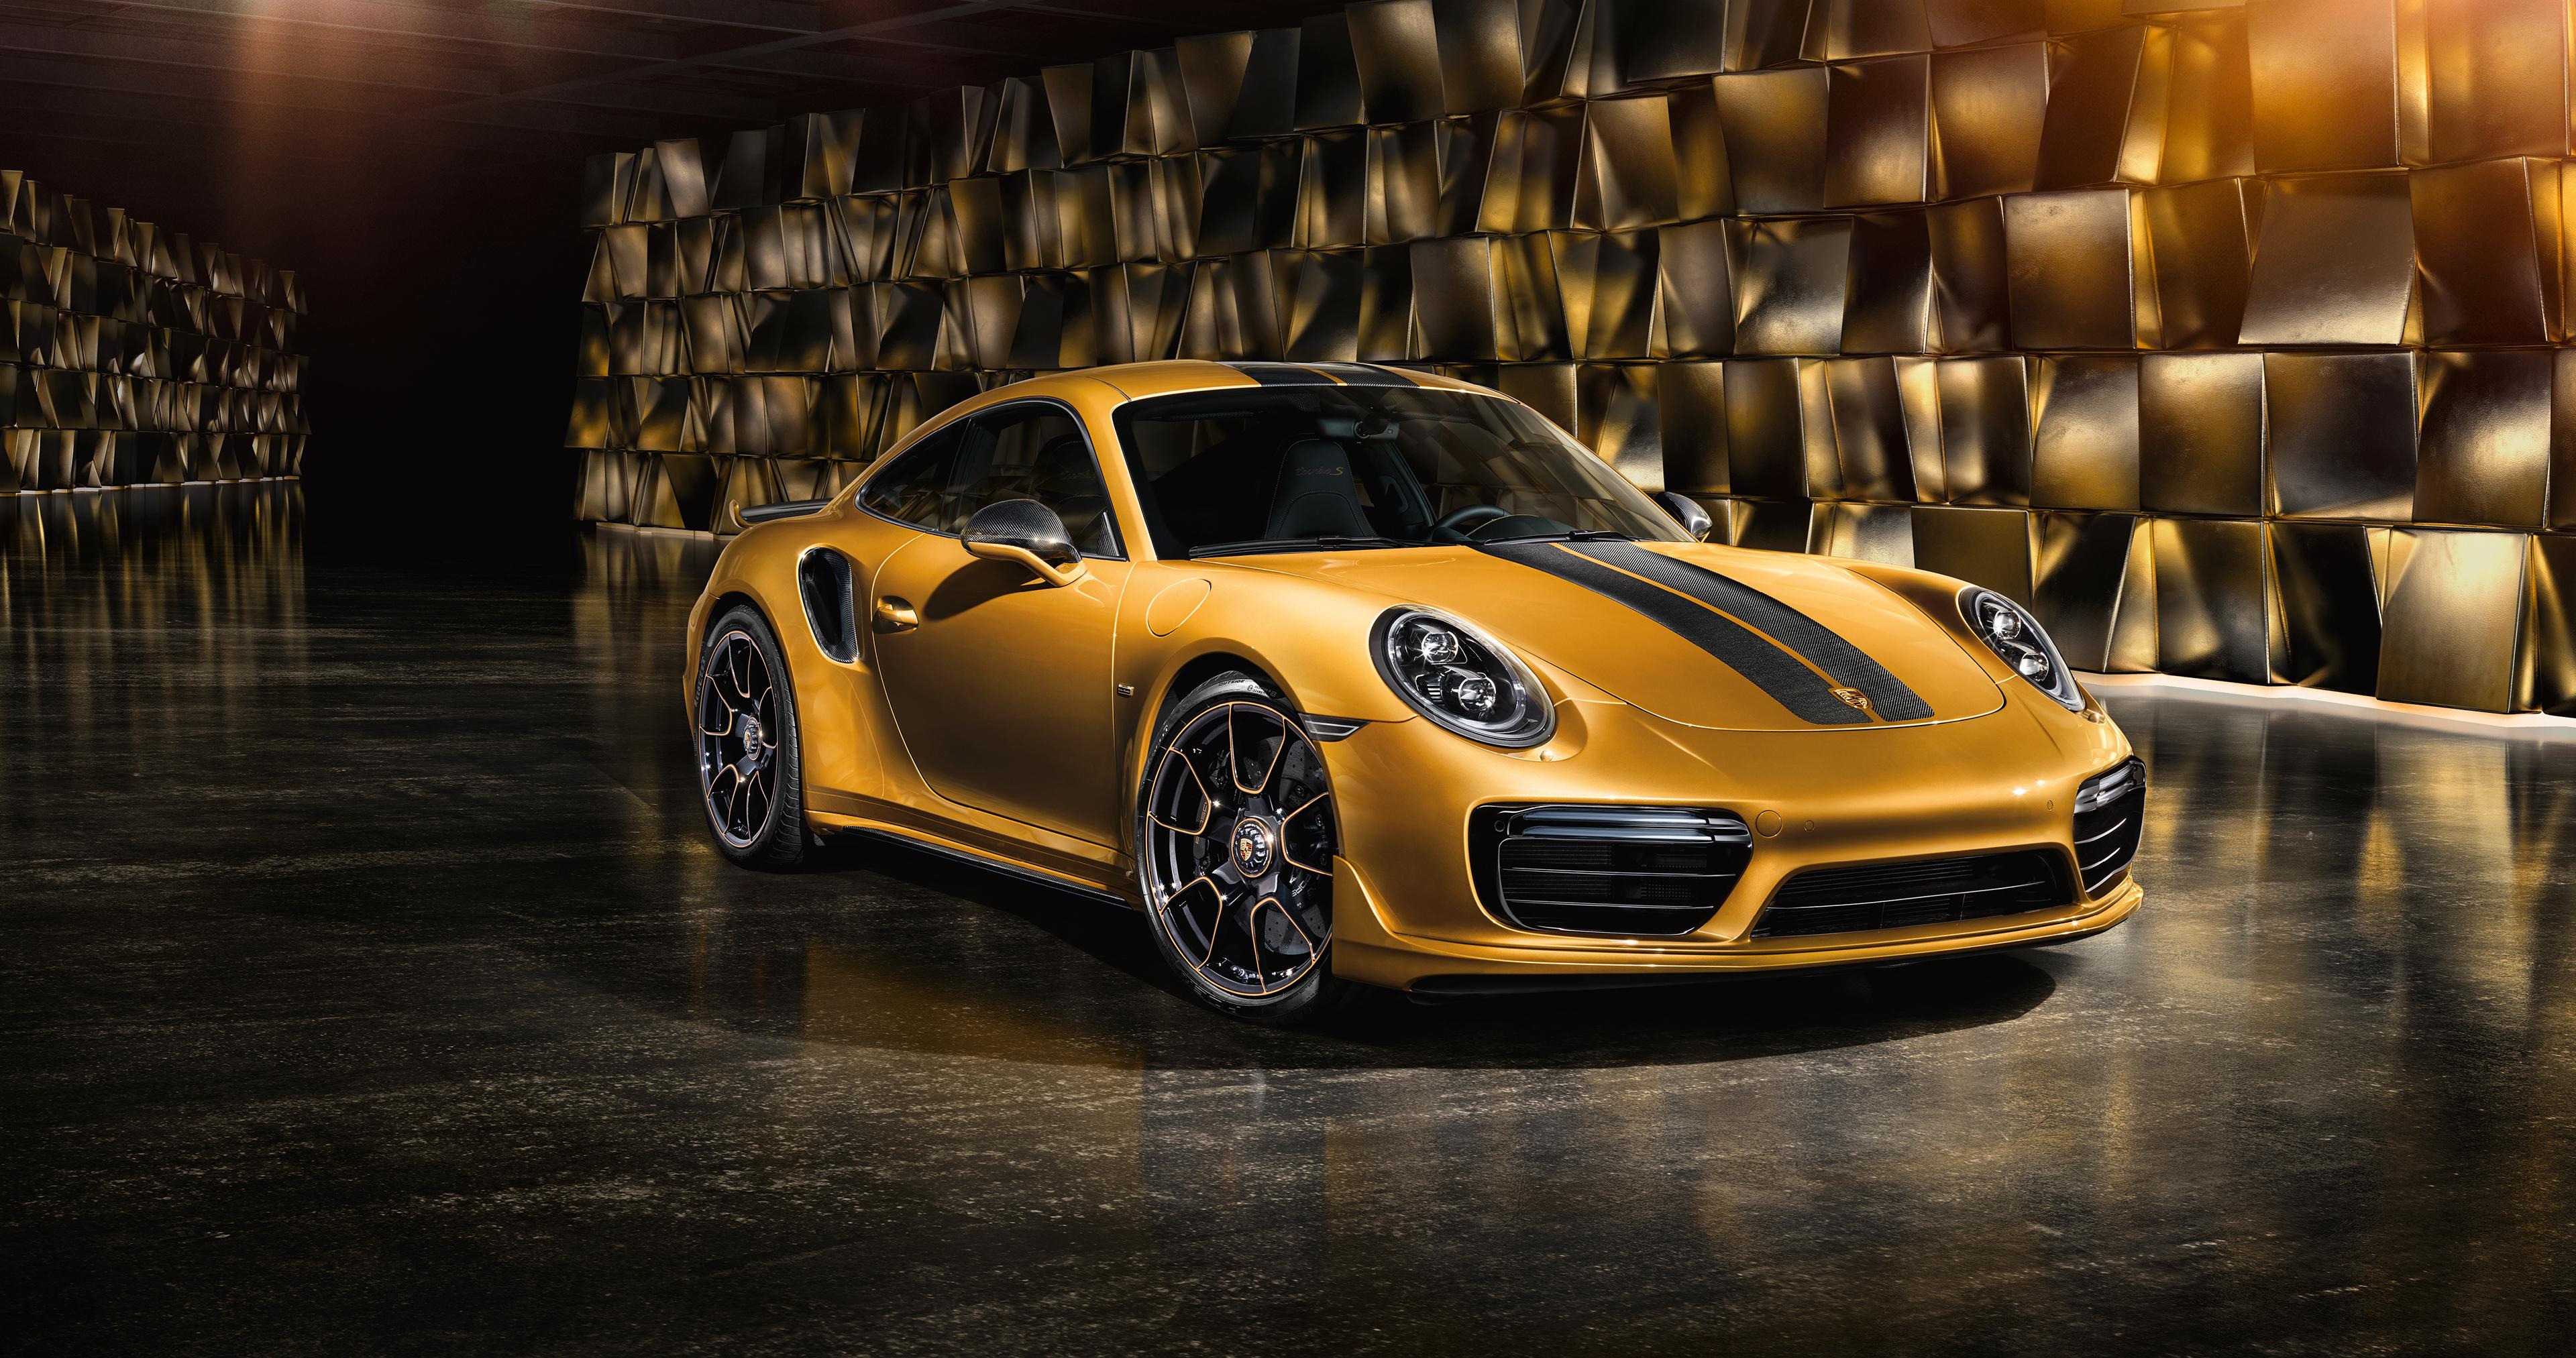 Porsche 991 Ii Turbo Hd Cars 4k Wallpapers Images